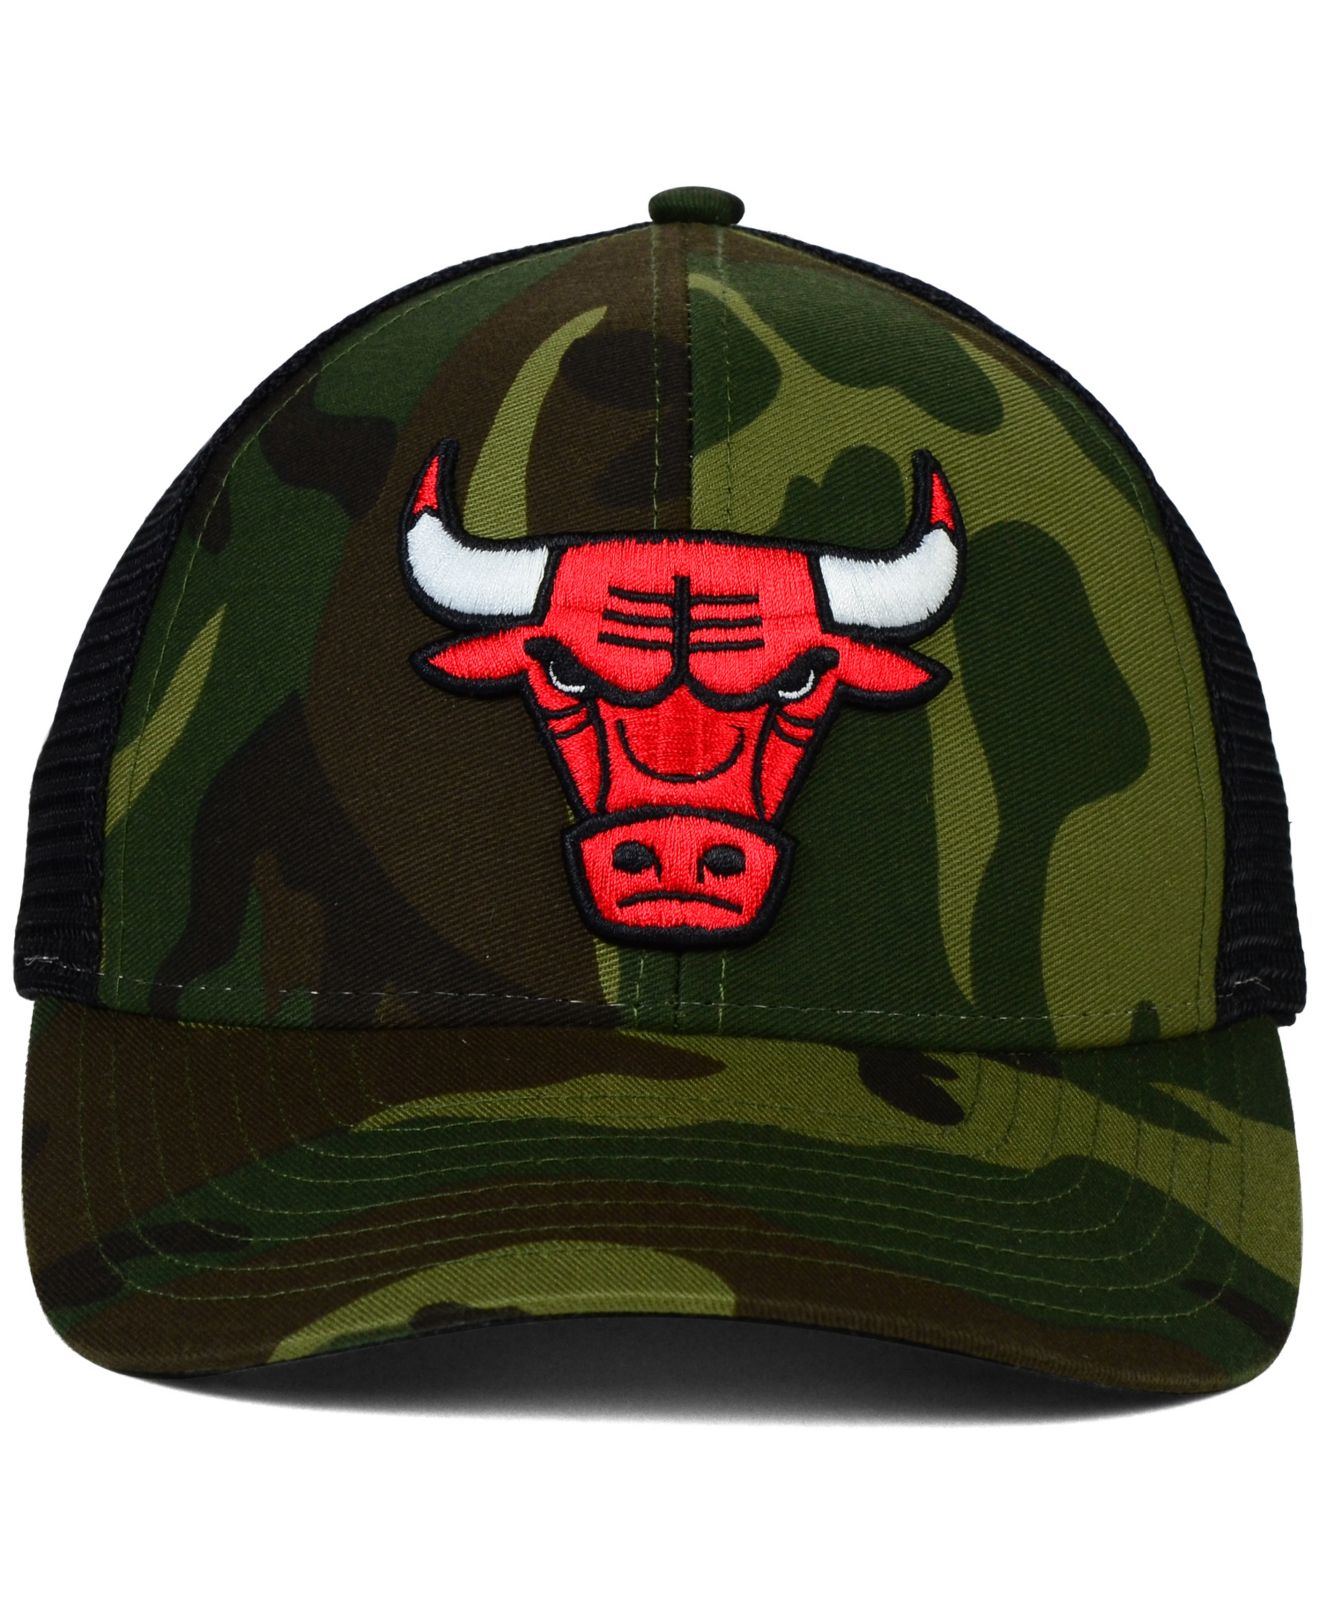 Lyst - adidas Chicago Bulls Camo Trucker Cap in Green for Men fd9ca35e9bc